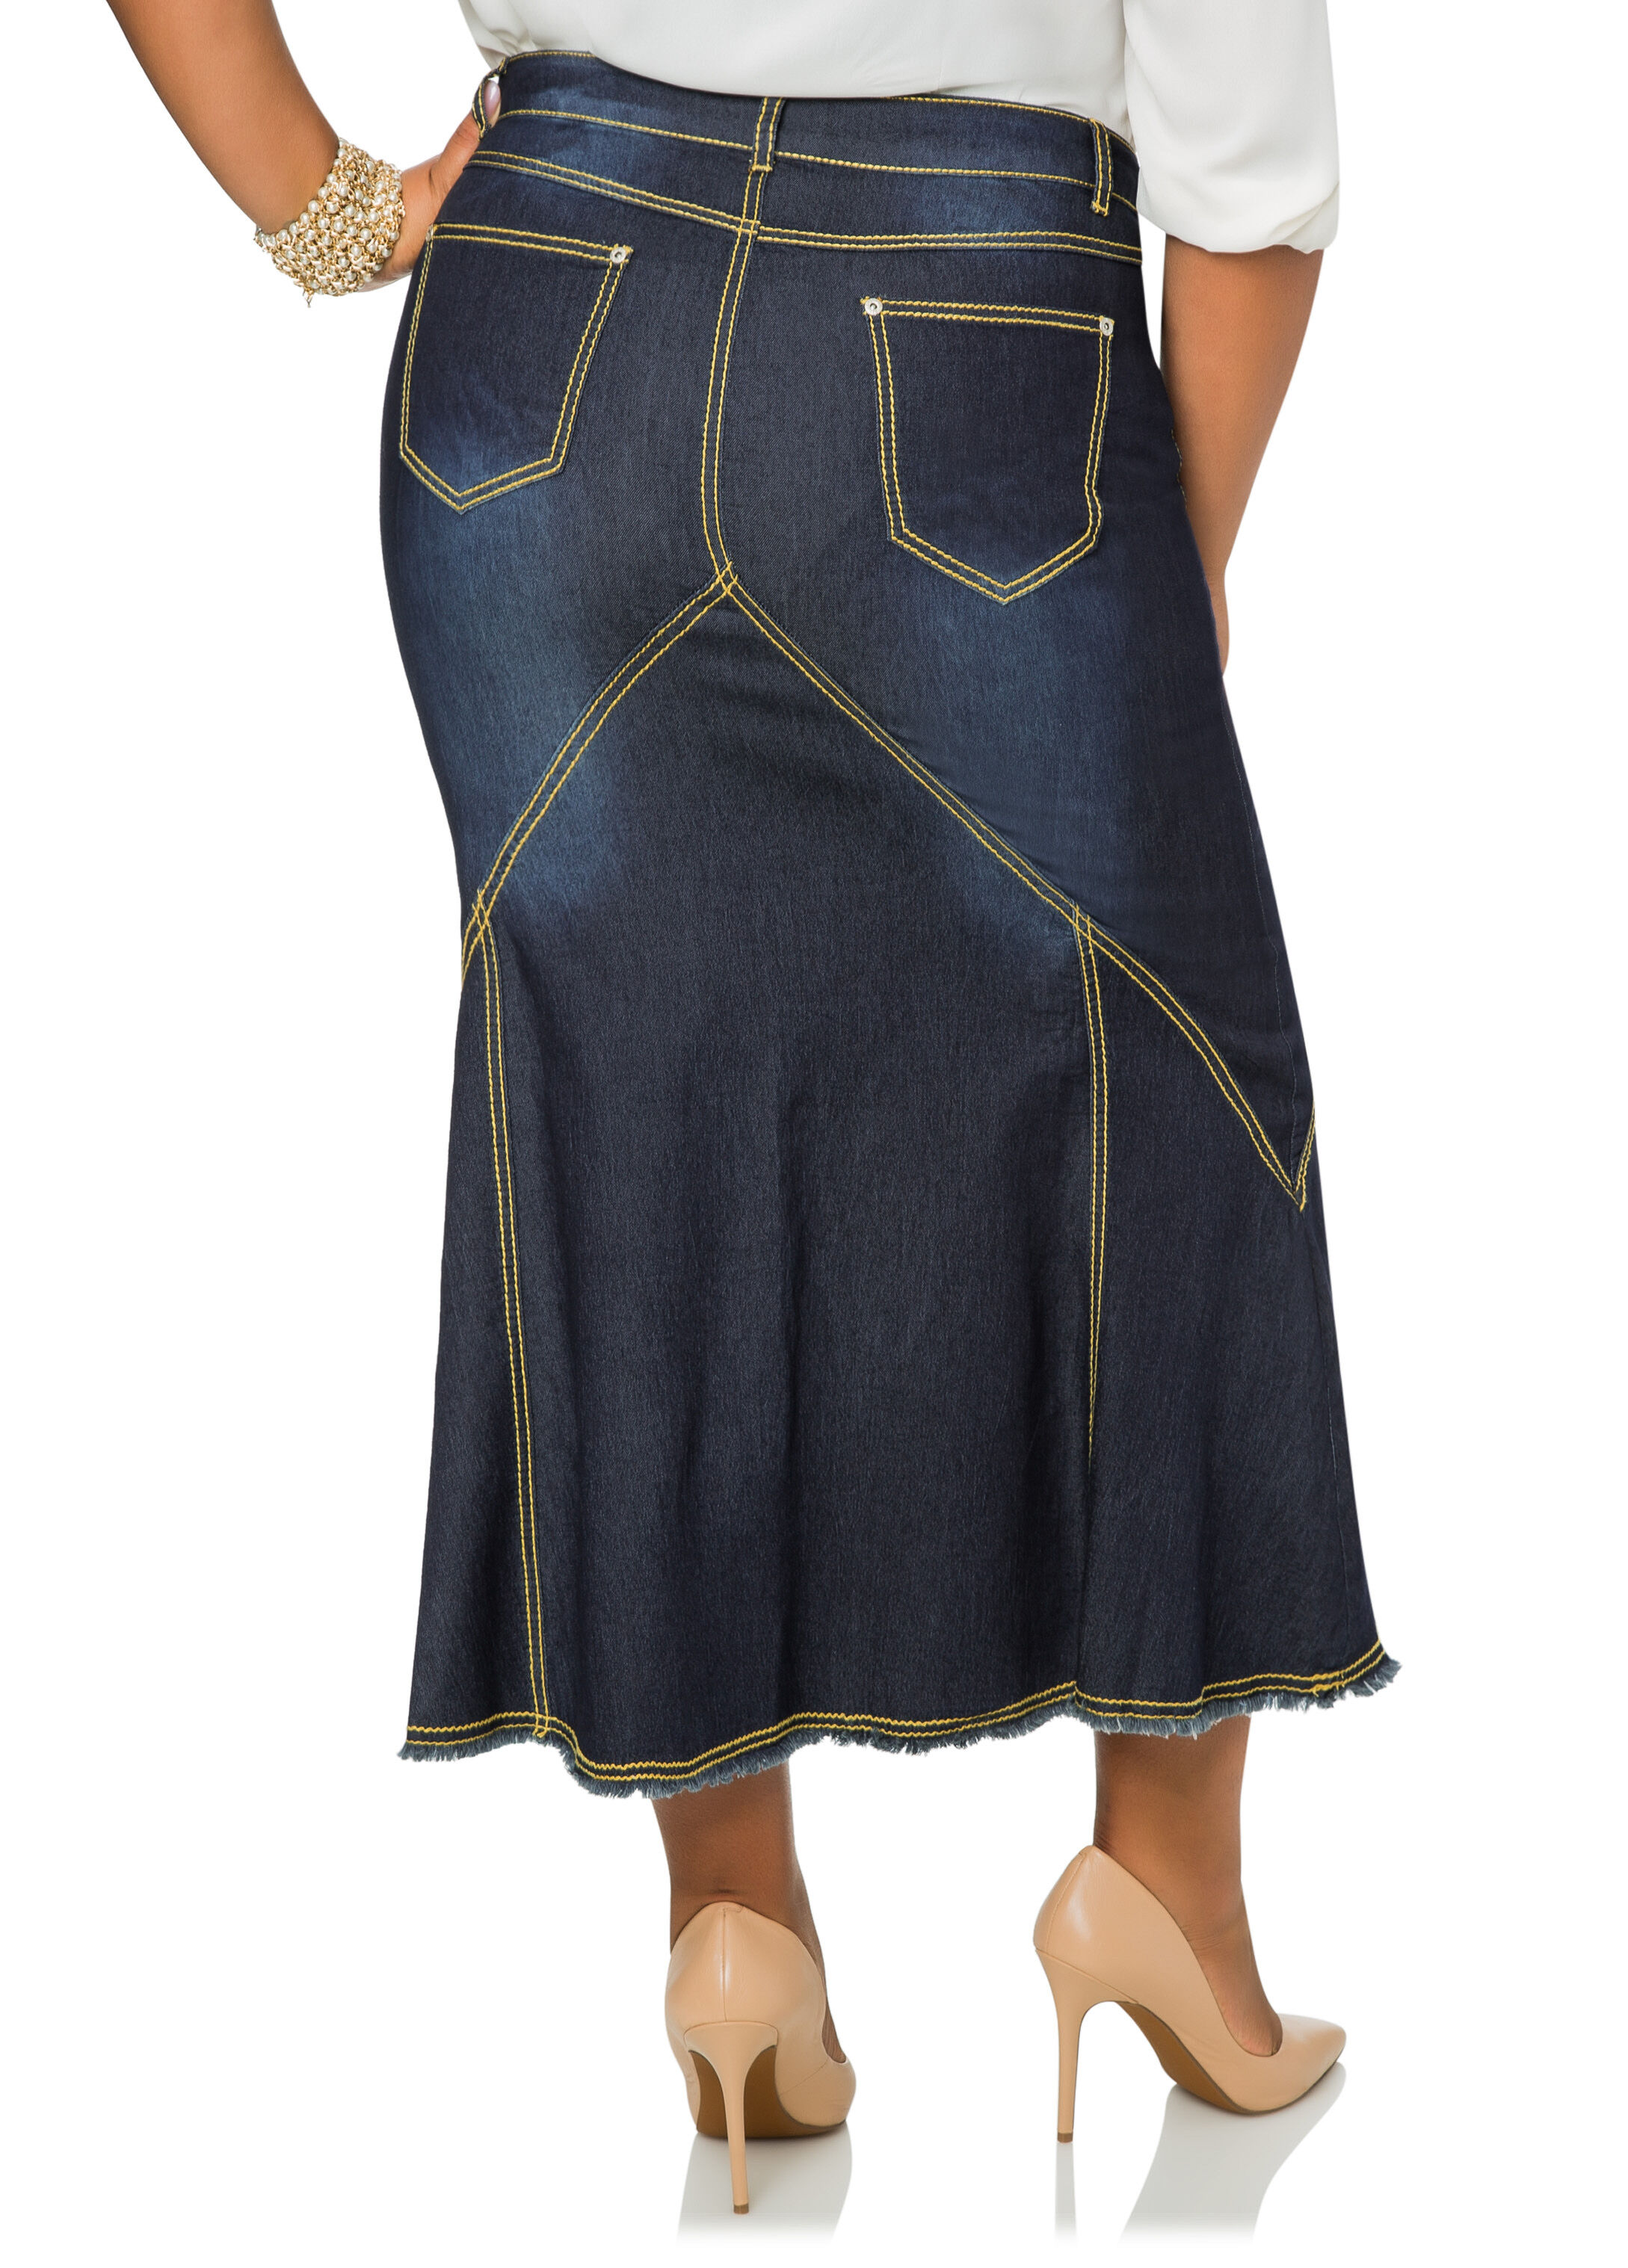 Plus Size Long Jean Skirts IvLQGuV6